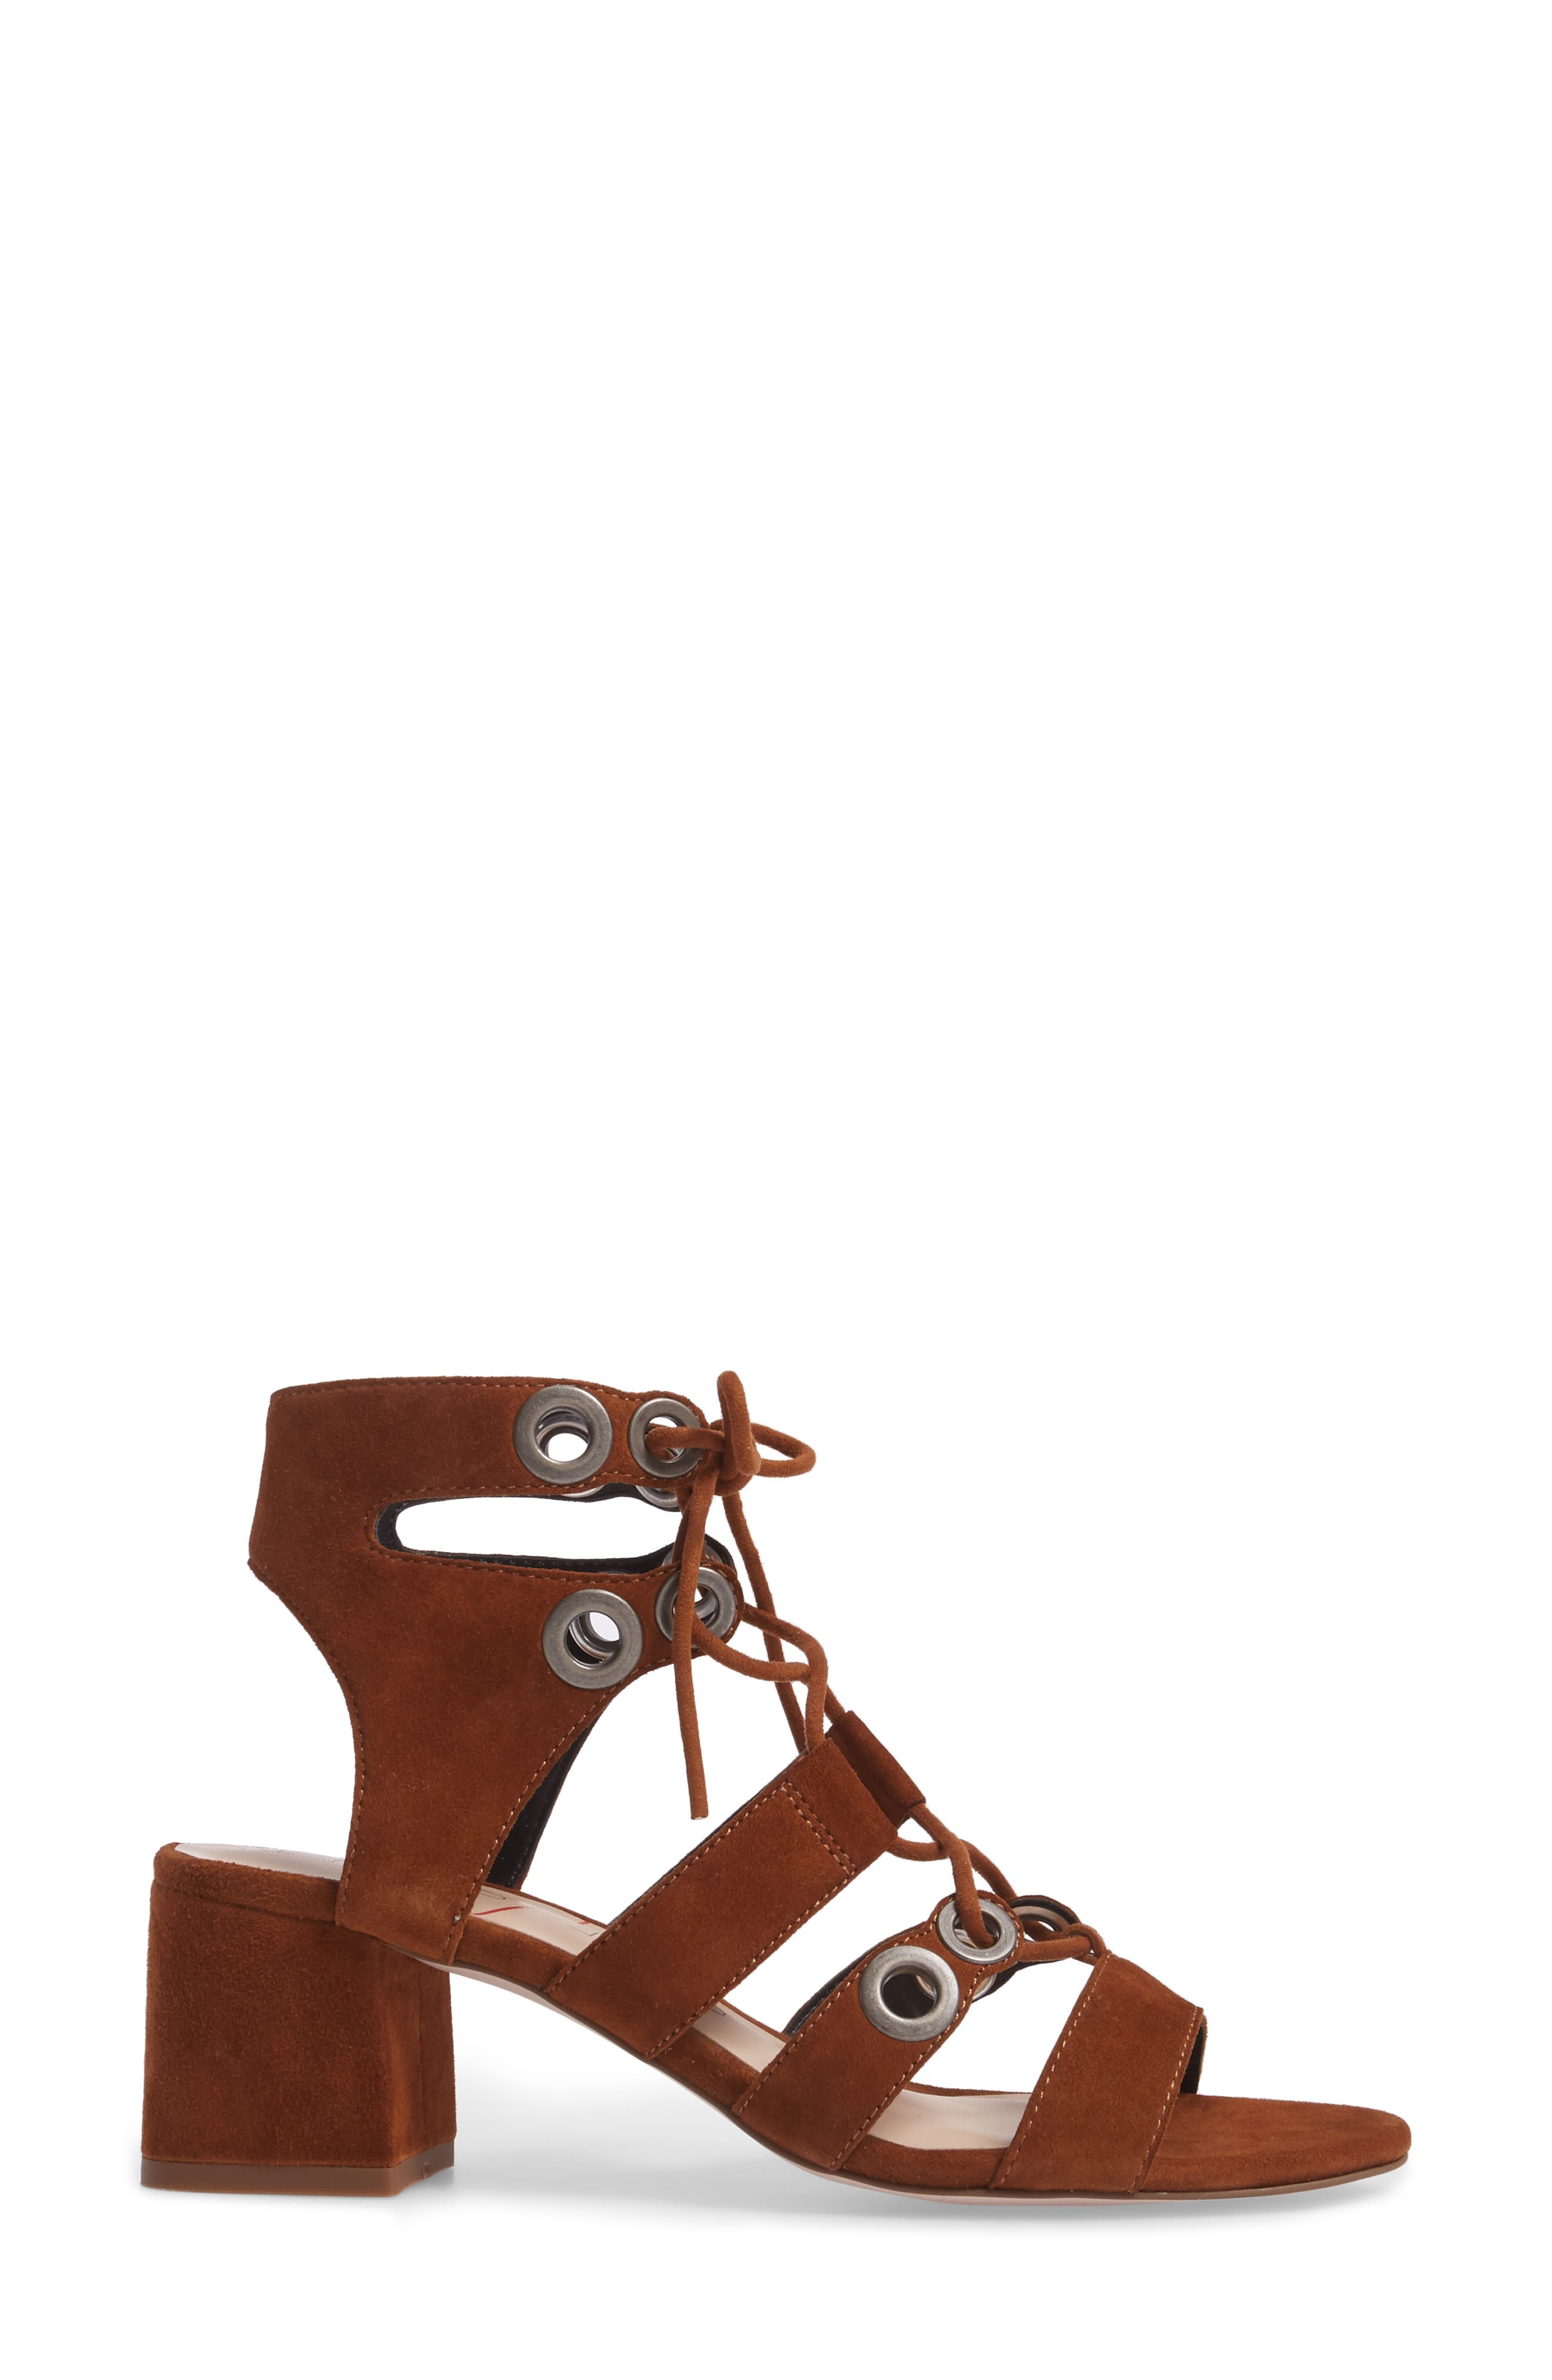 Alternate Image 3  - Sole Society Rosemary Lace-Up Sandal (Women)